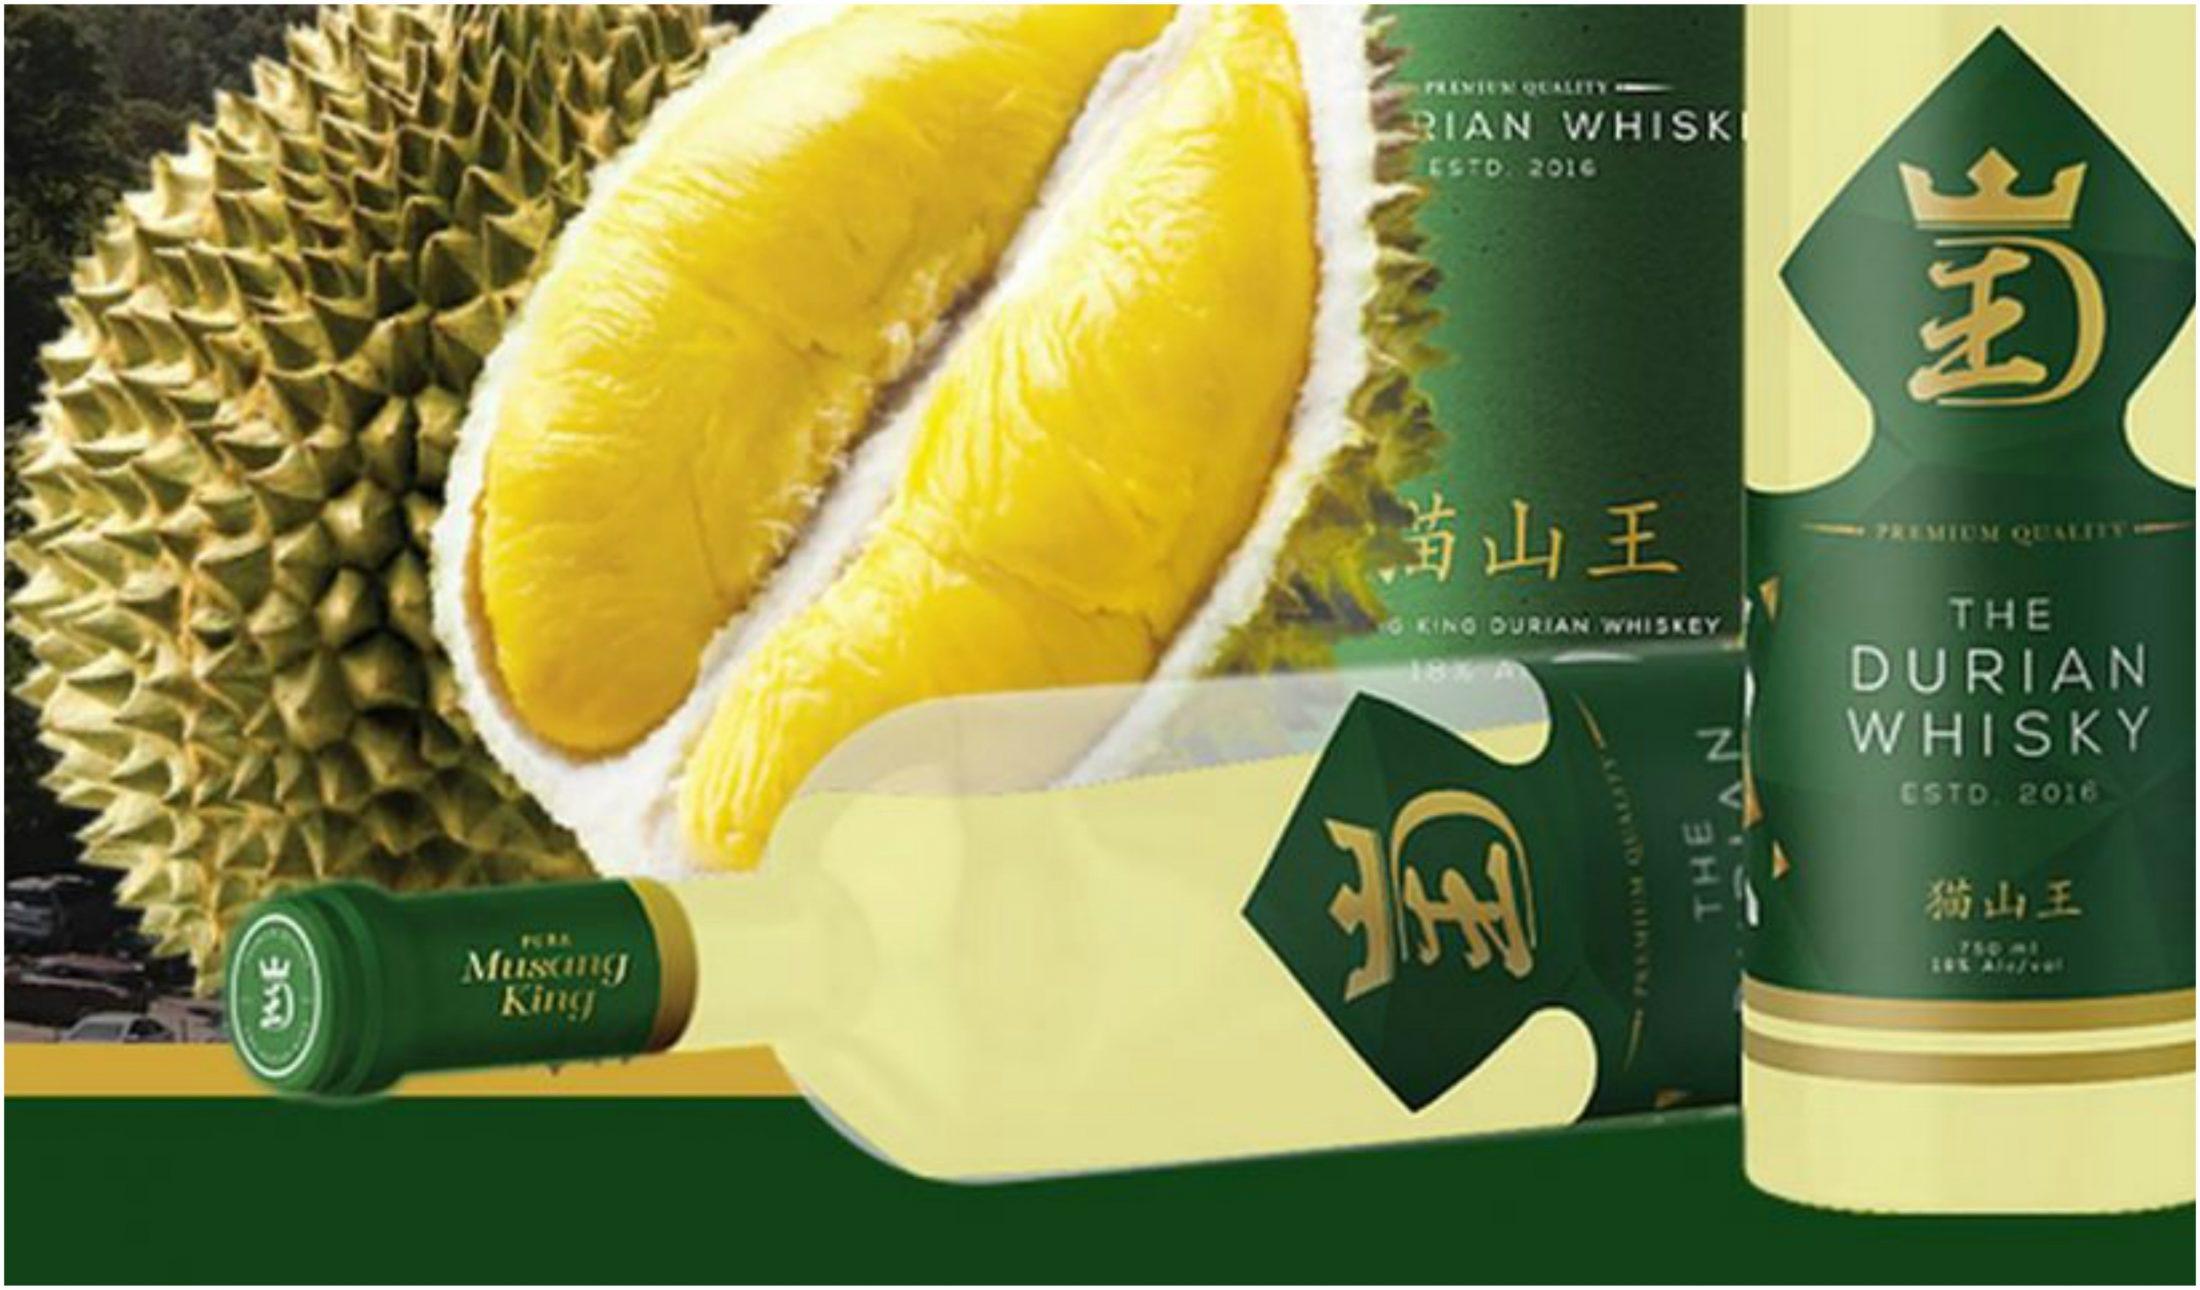 Két nehézsúlyú egy üvegben: Durian whisky a piacon - Dining Guide